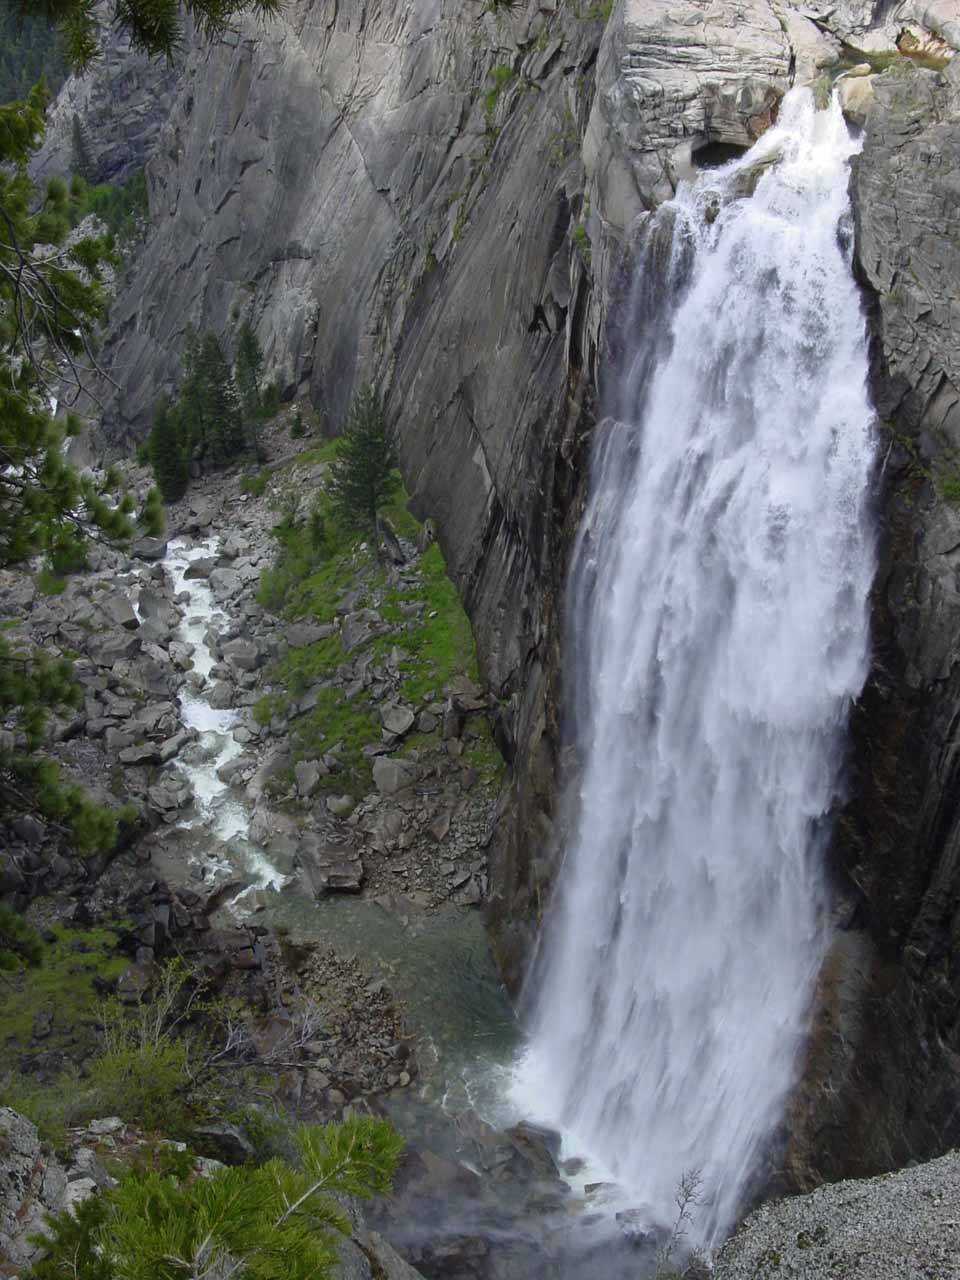 Full view of Illilouette Fall (taken in April 2004)